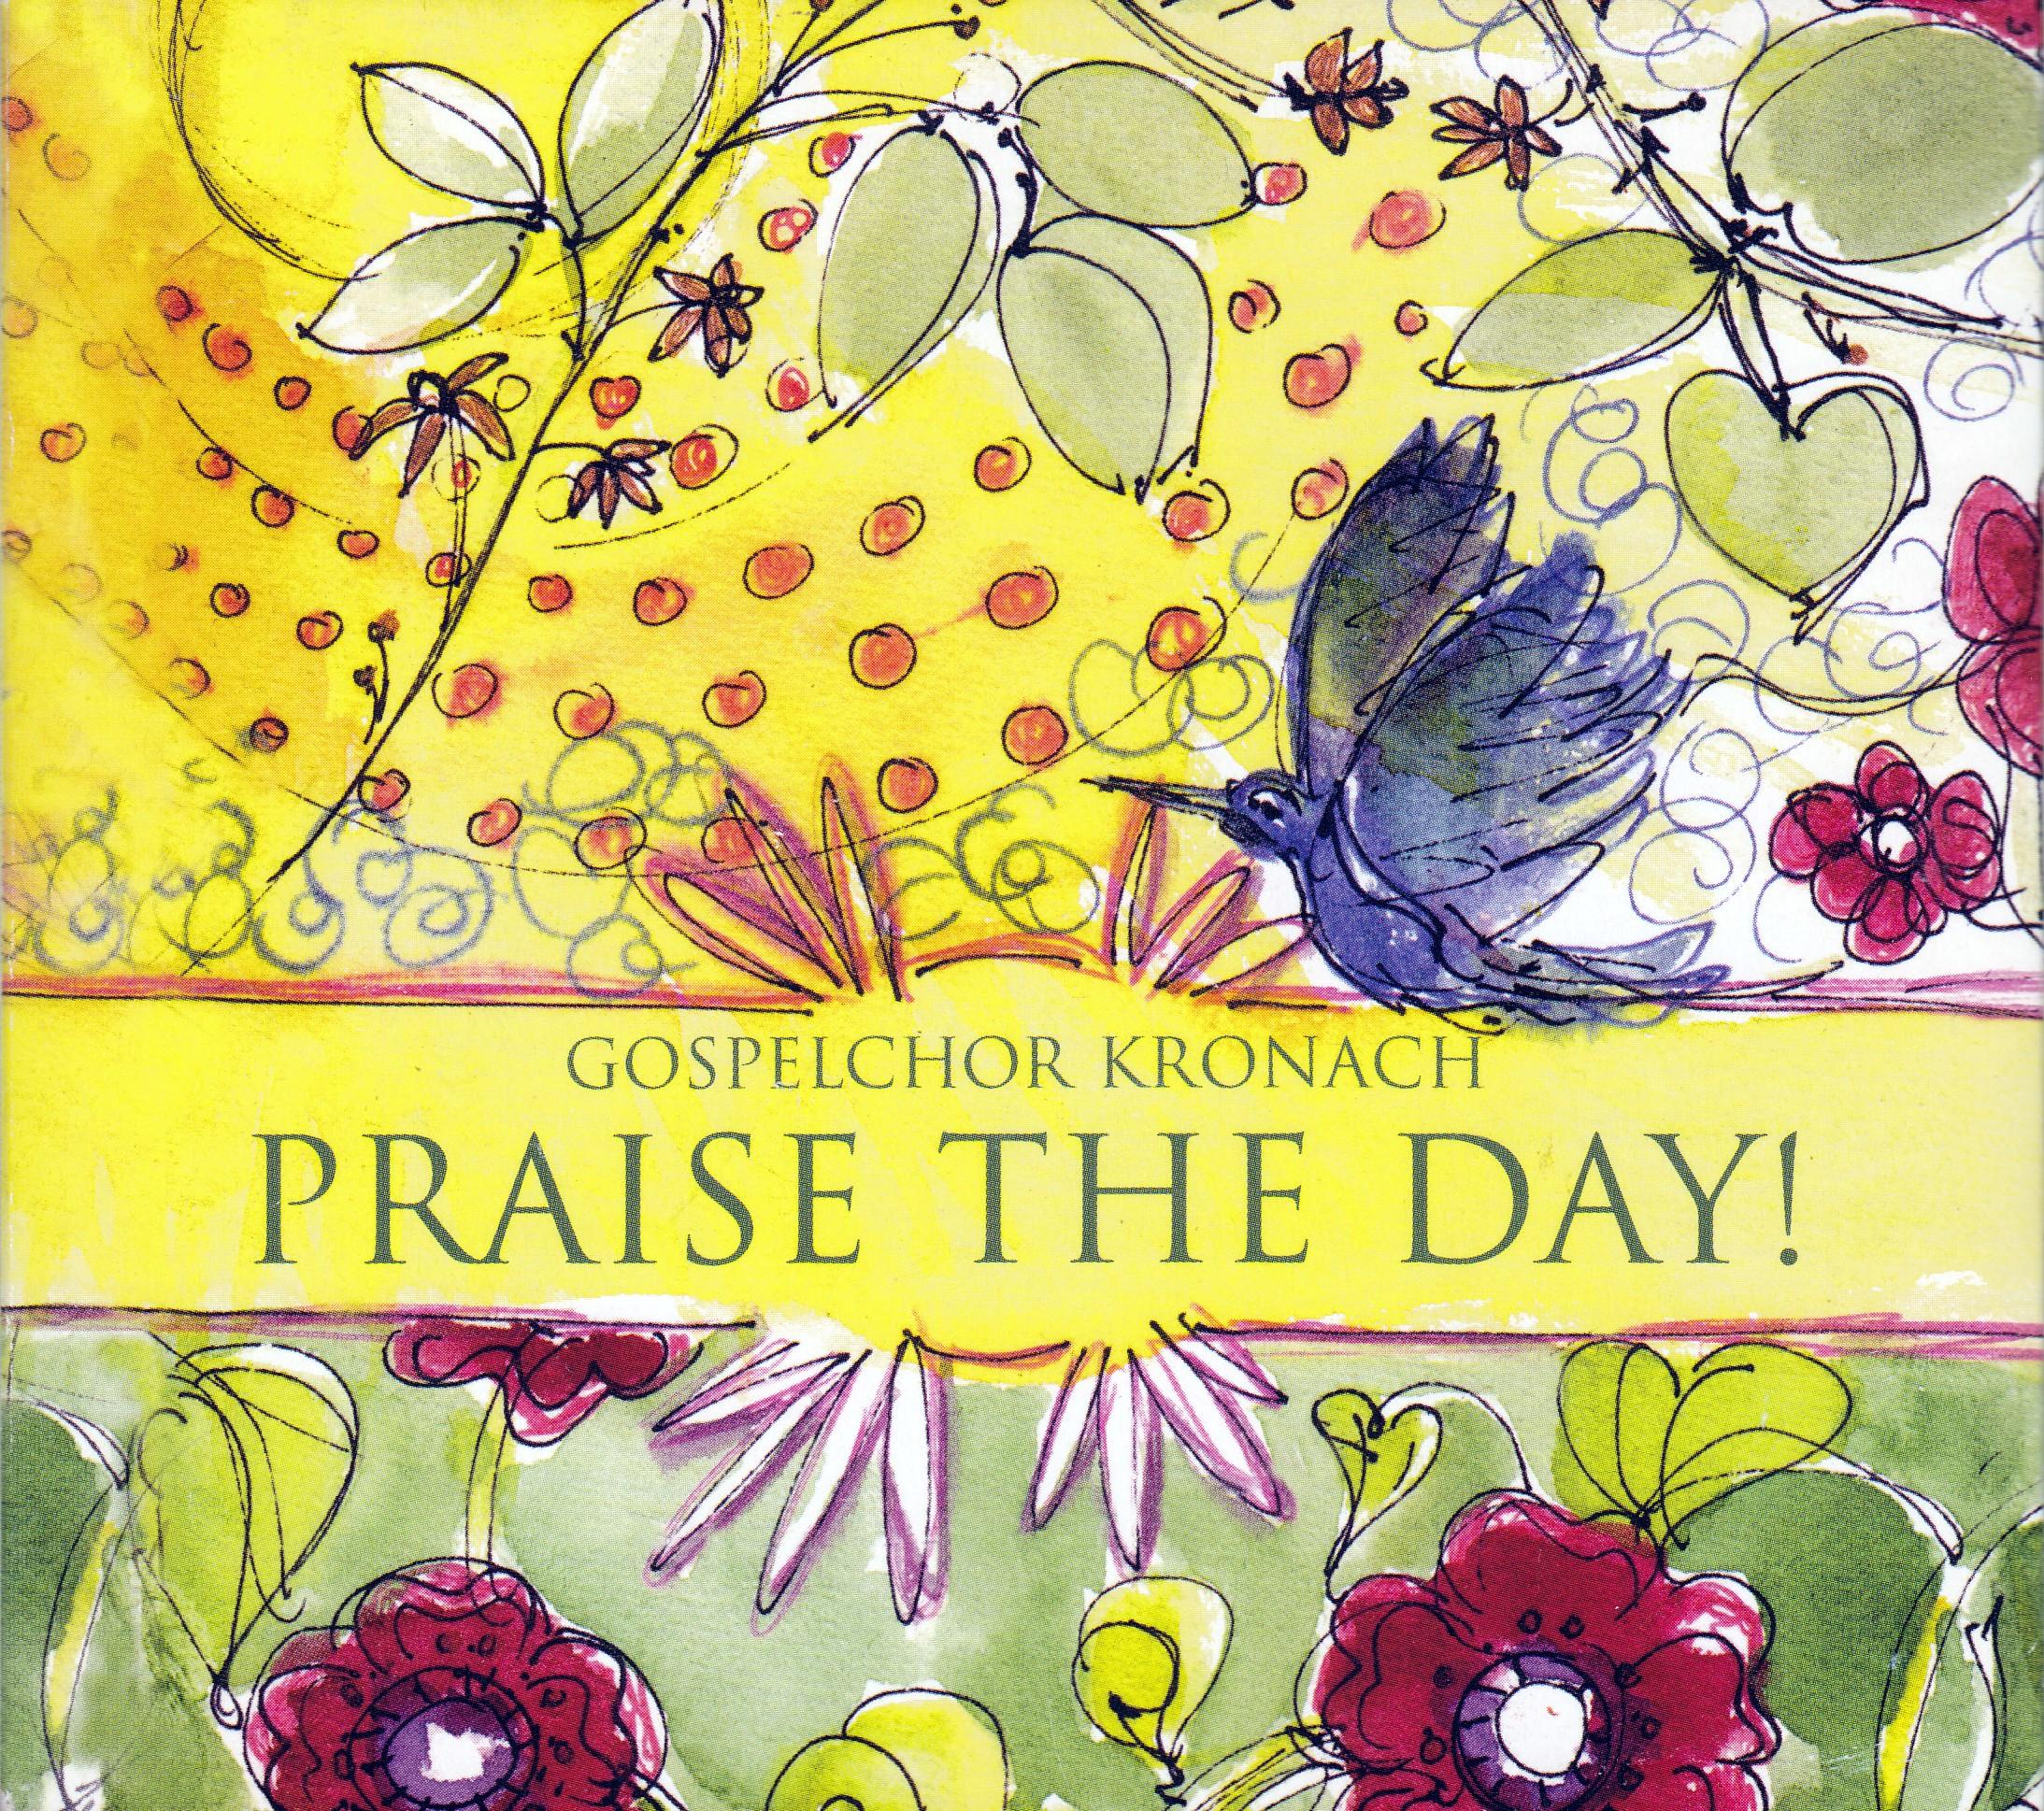 Praise_the_day-Cover.jpg